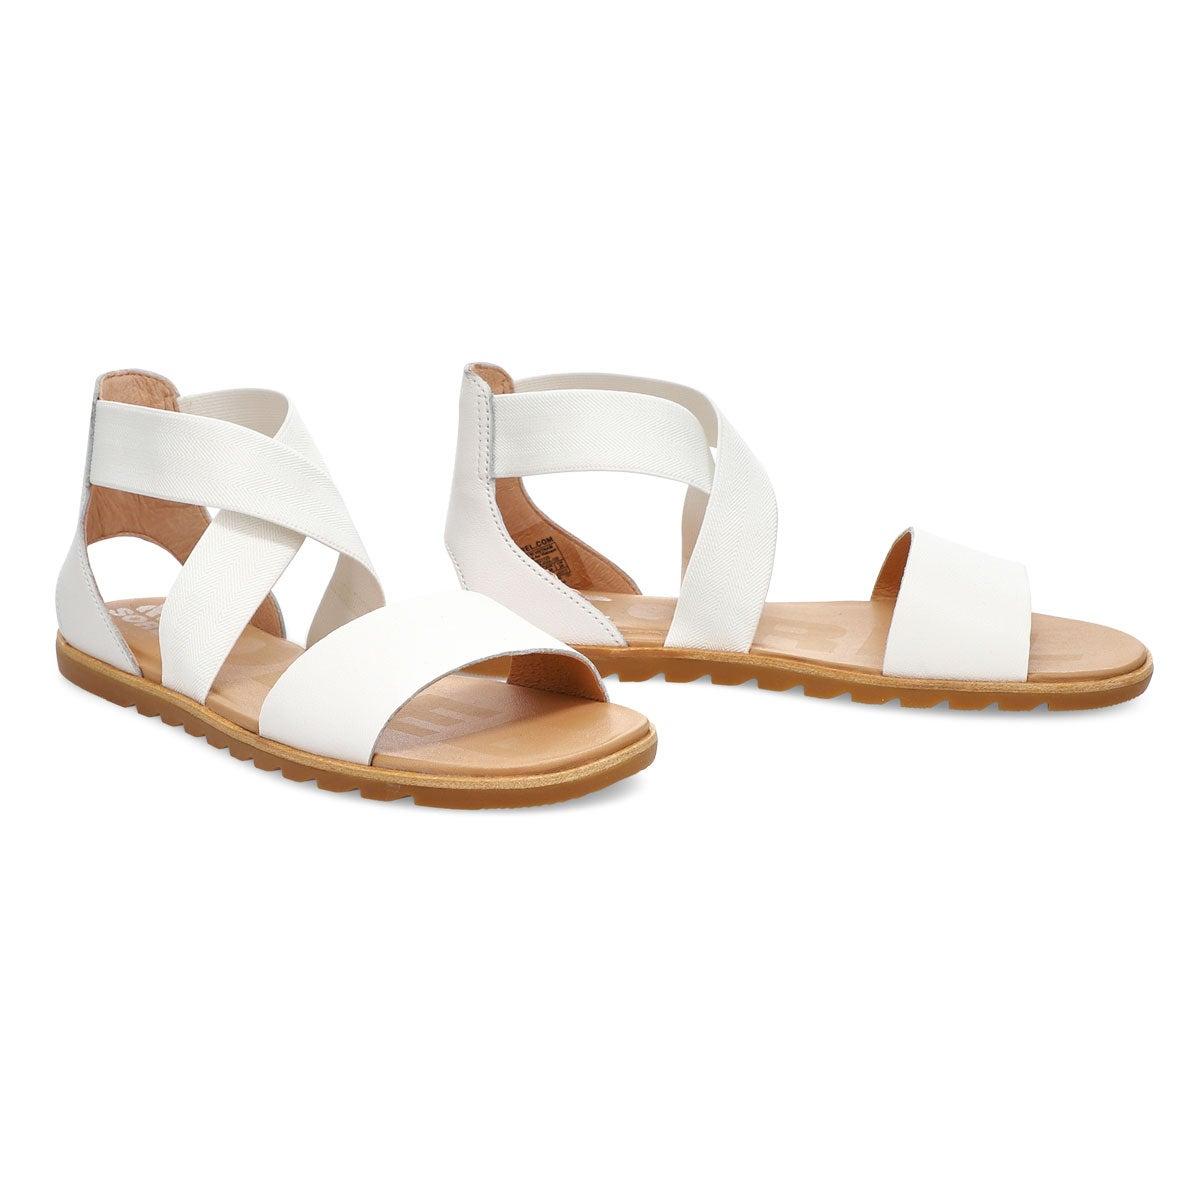 Sandales décontractées ELLA II, sel de mer, femmes